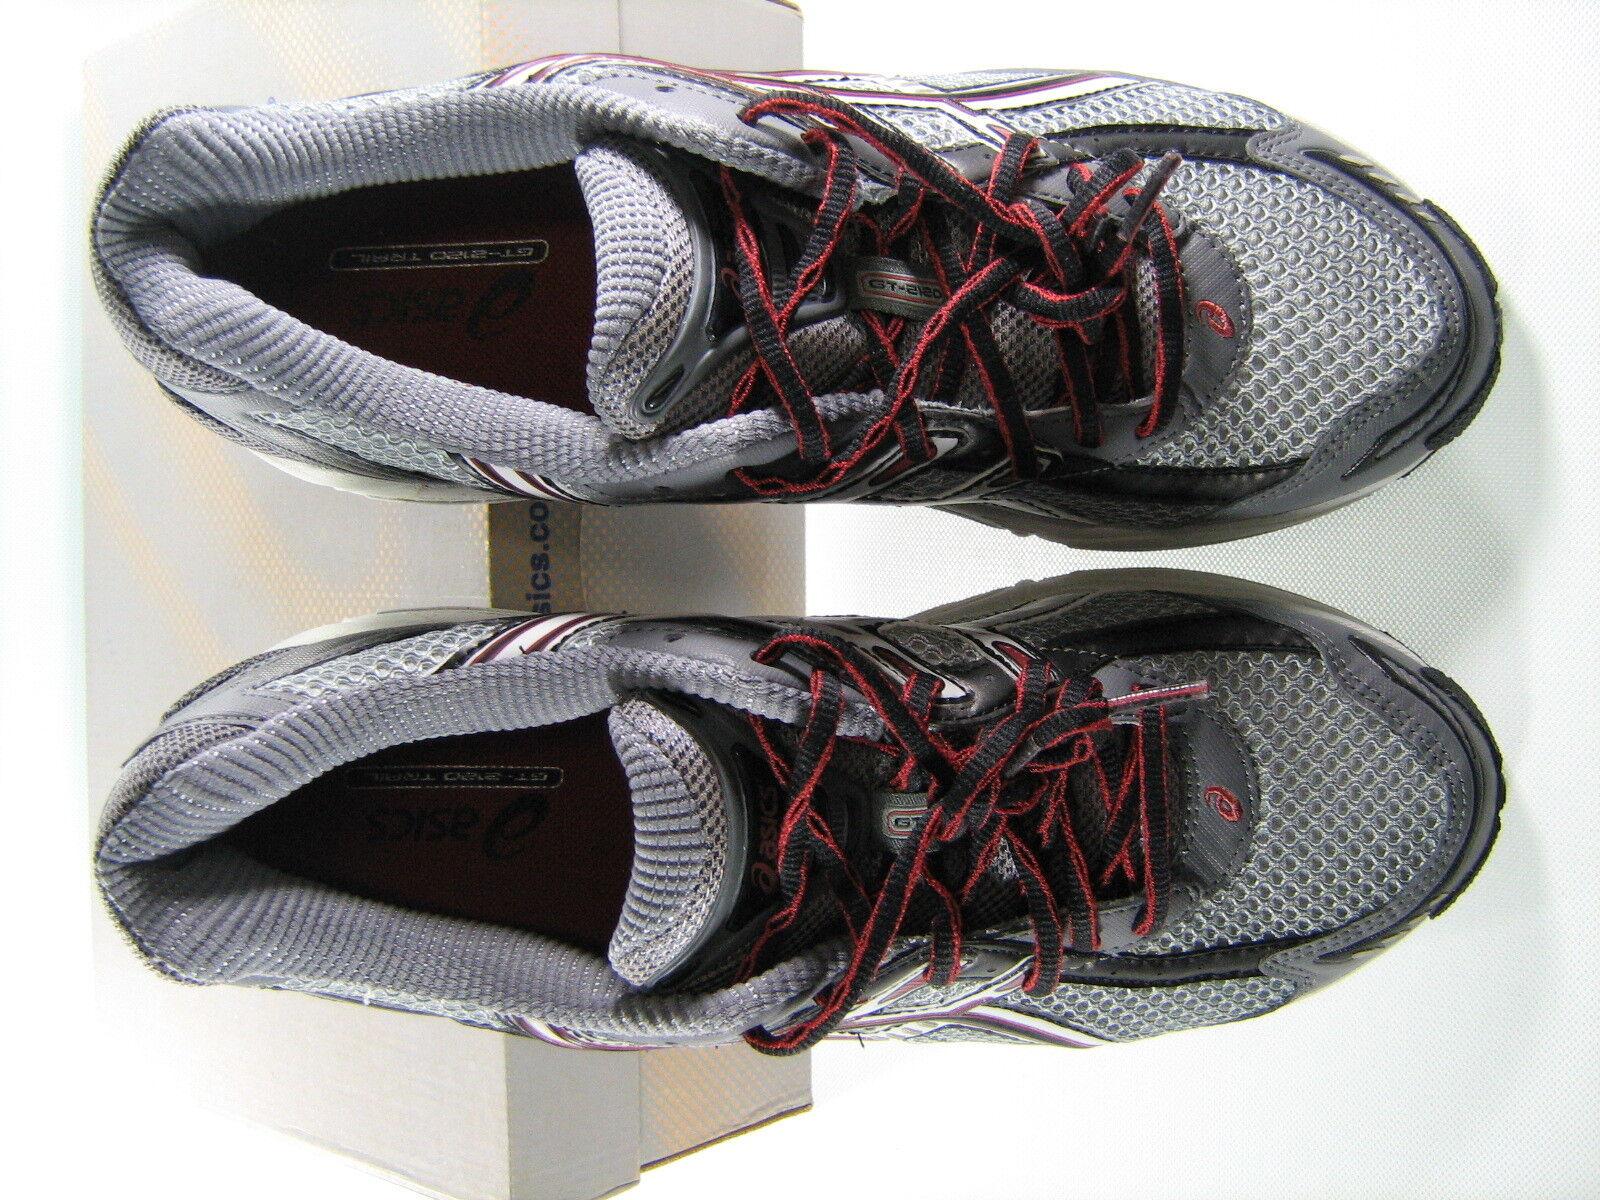 TENNIS Chaussures ASICS TN709 Gt2120 TRAIL 10 MEDIUM 9.544 EU SNEAKERS SPORT